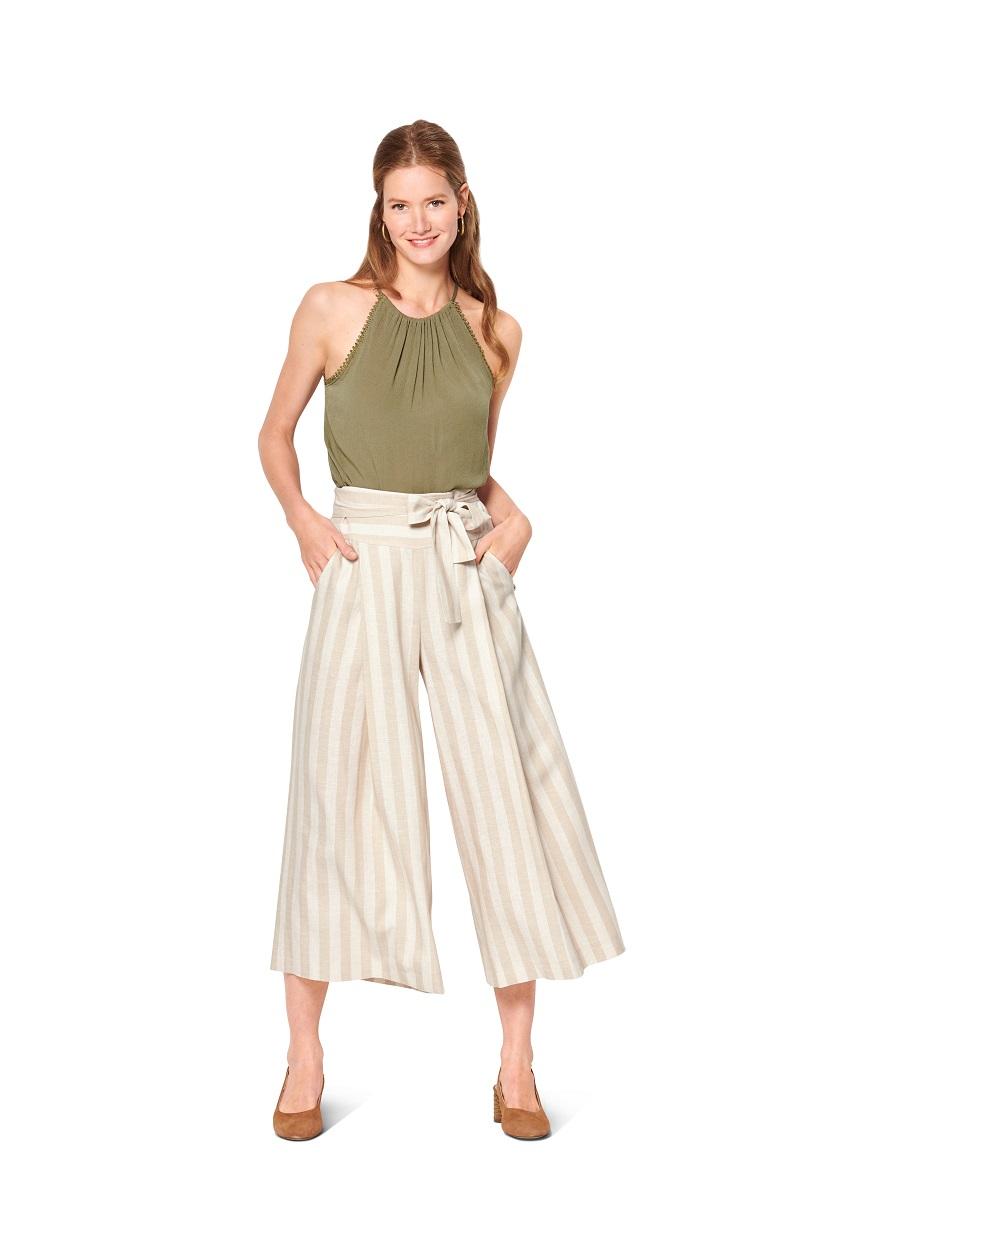 Culotte und Short. Burda #6138